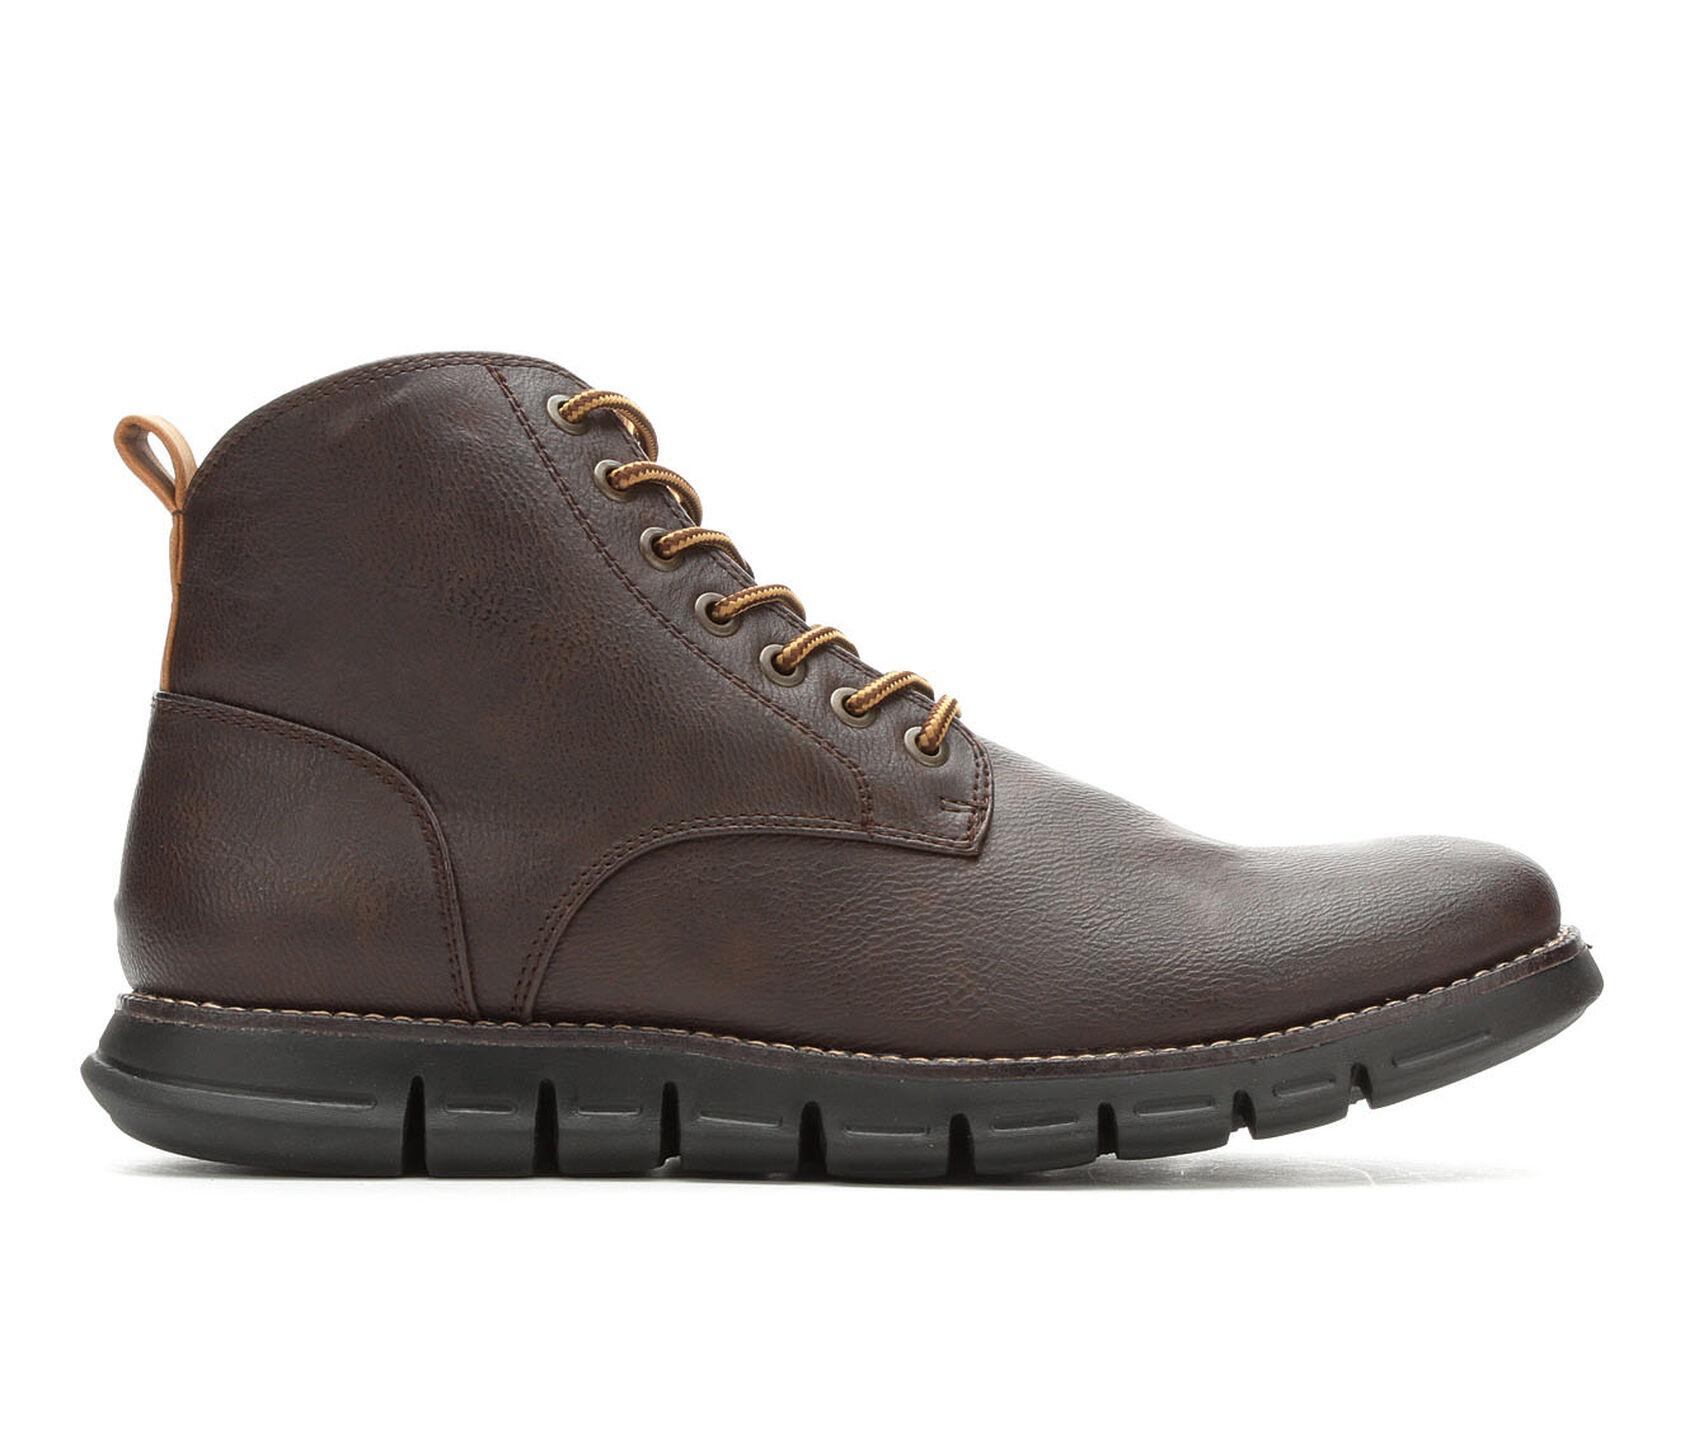 74c21c7d19a ... Kenneth Cole Reaction Design 21755 Chukka Boots. Previous